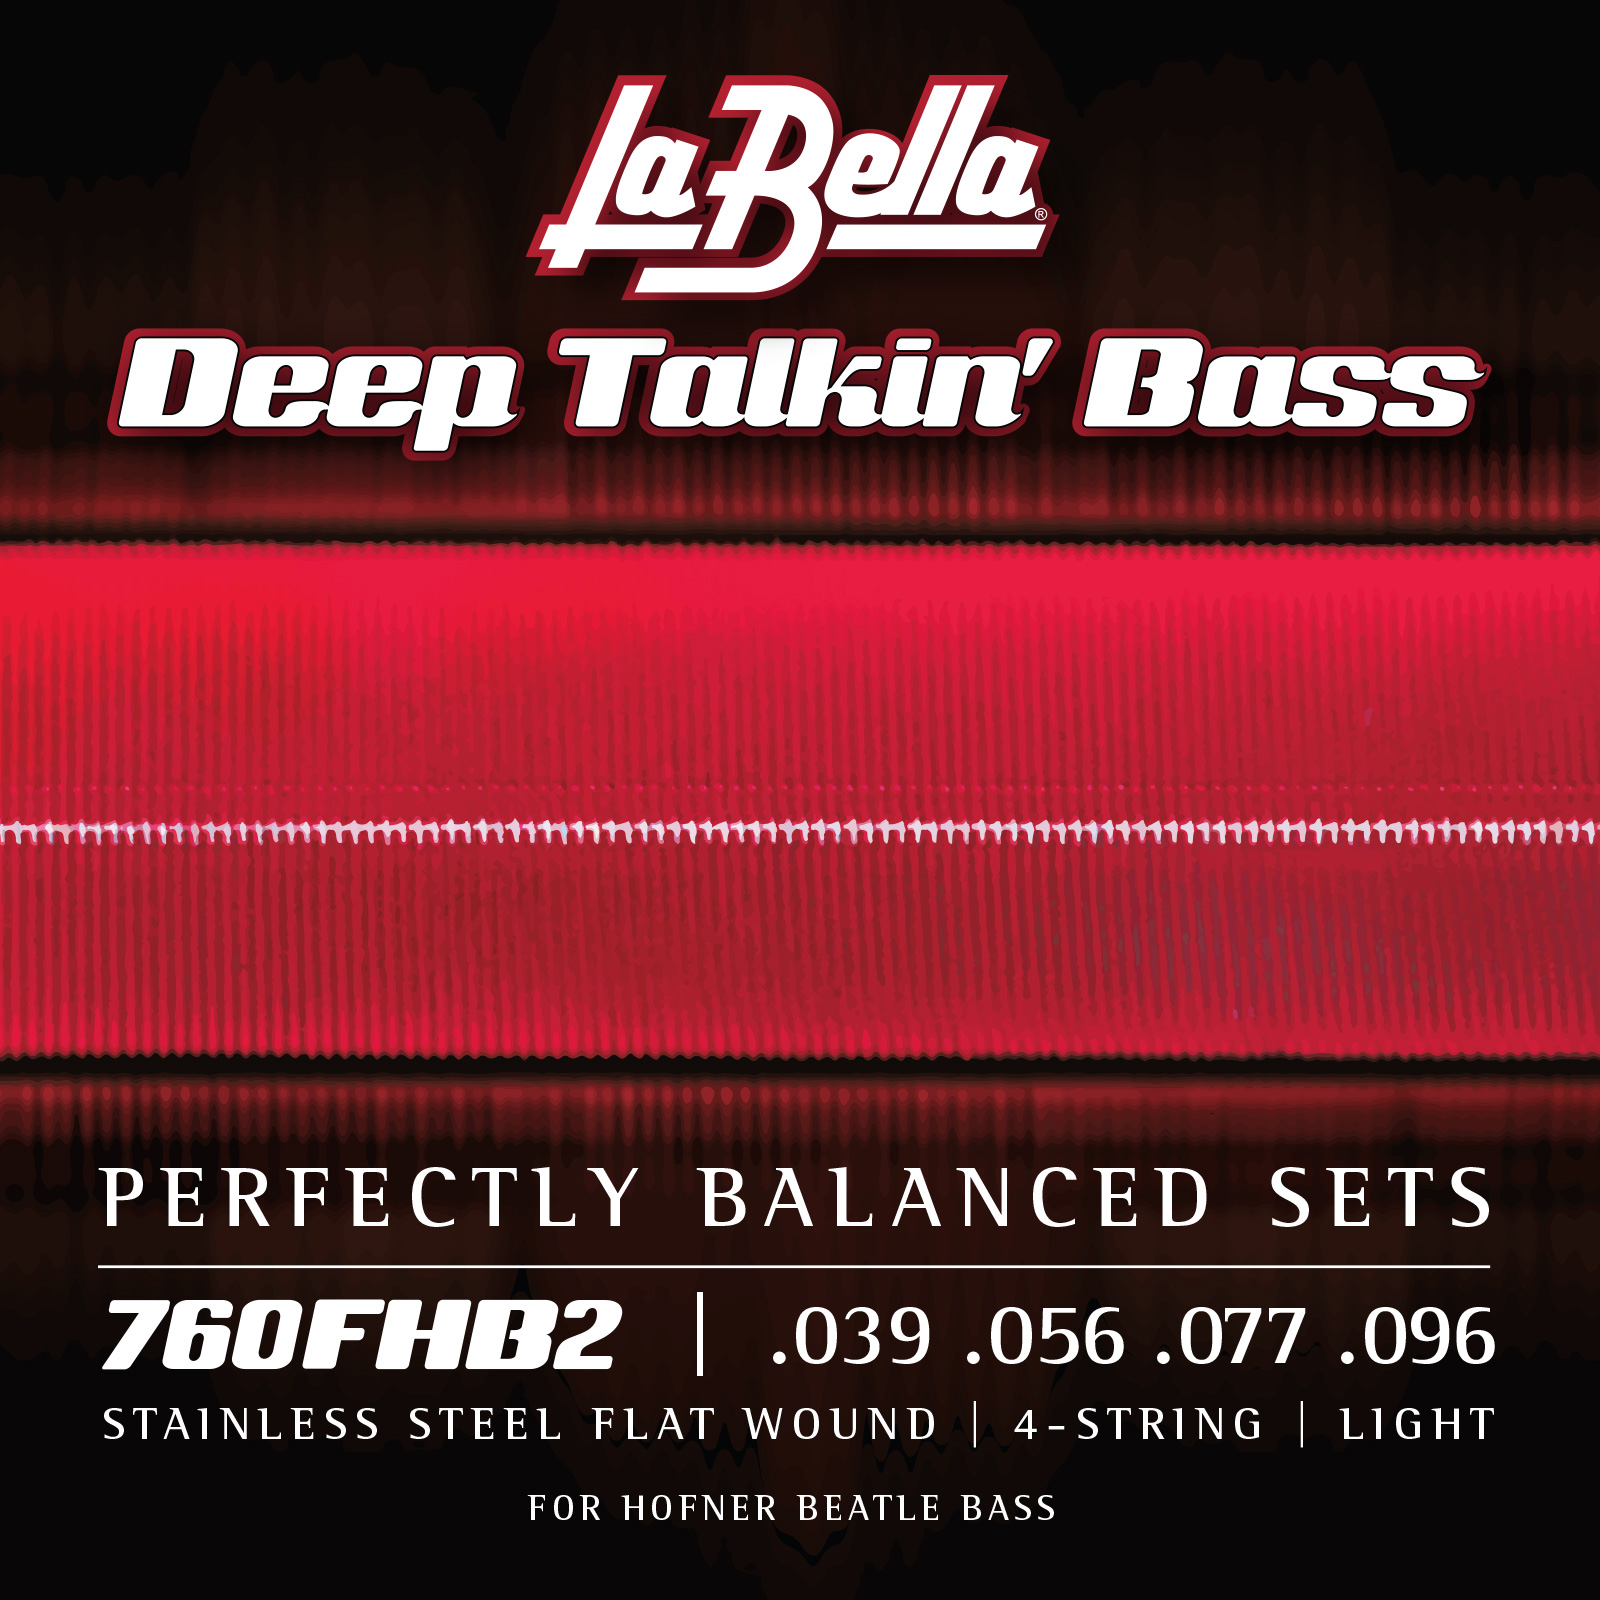 Corde lisce La Bella Deep Talkin' Bass .039 – .096 760FHB2